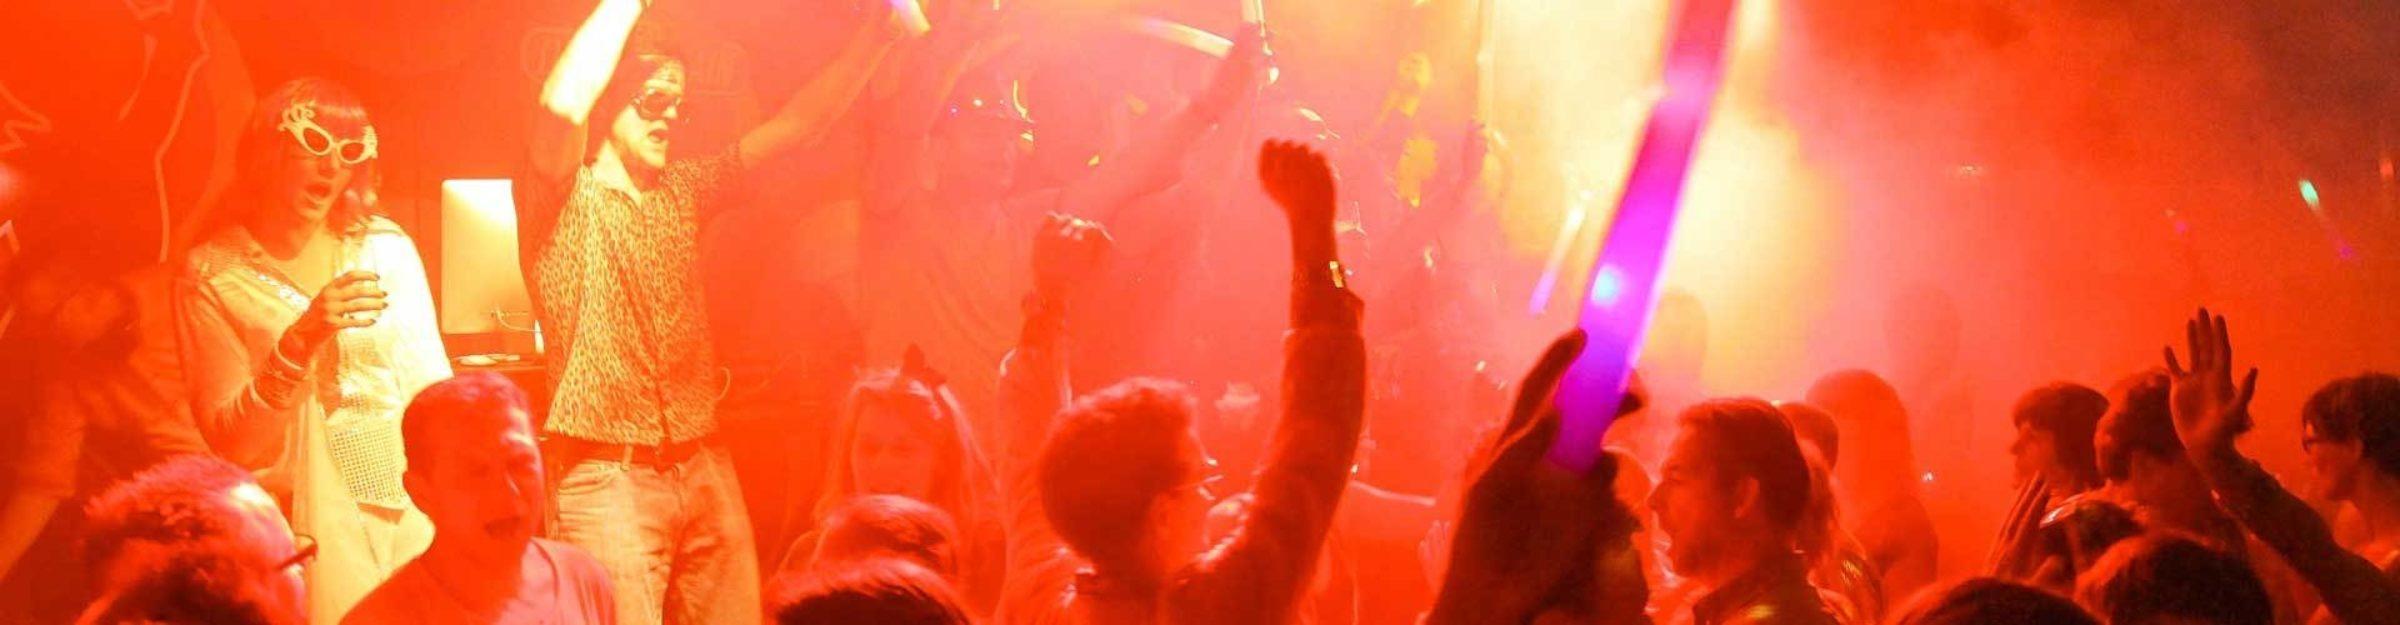 Enschede Fellini Disco Party Slide 07